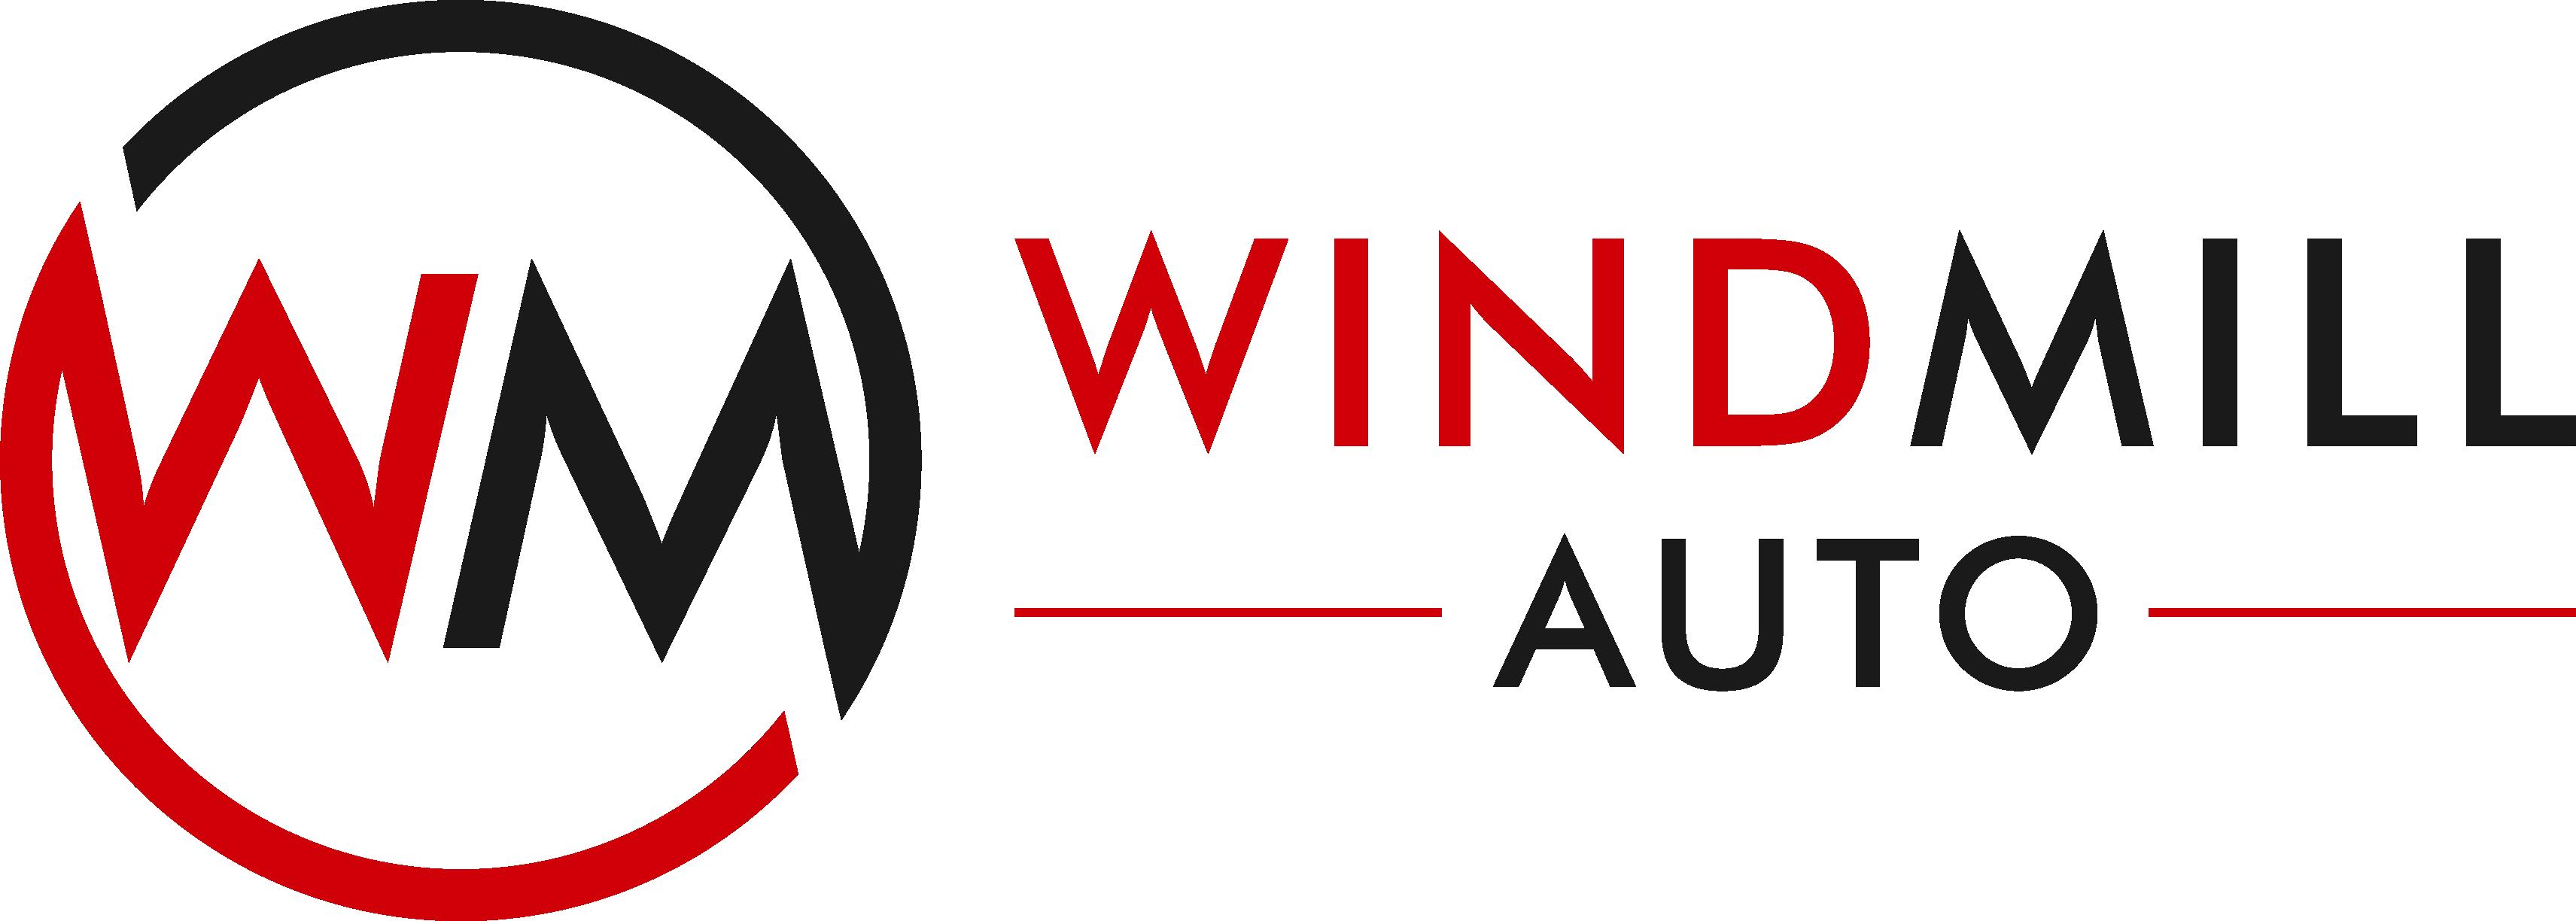 Windmill Auto